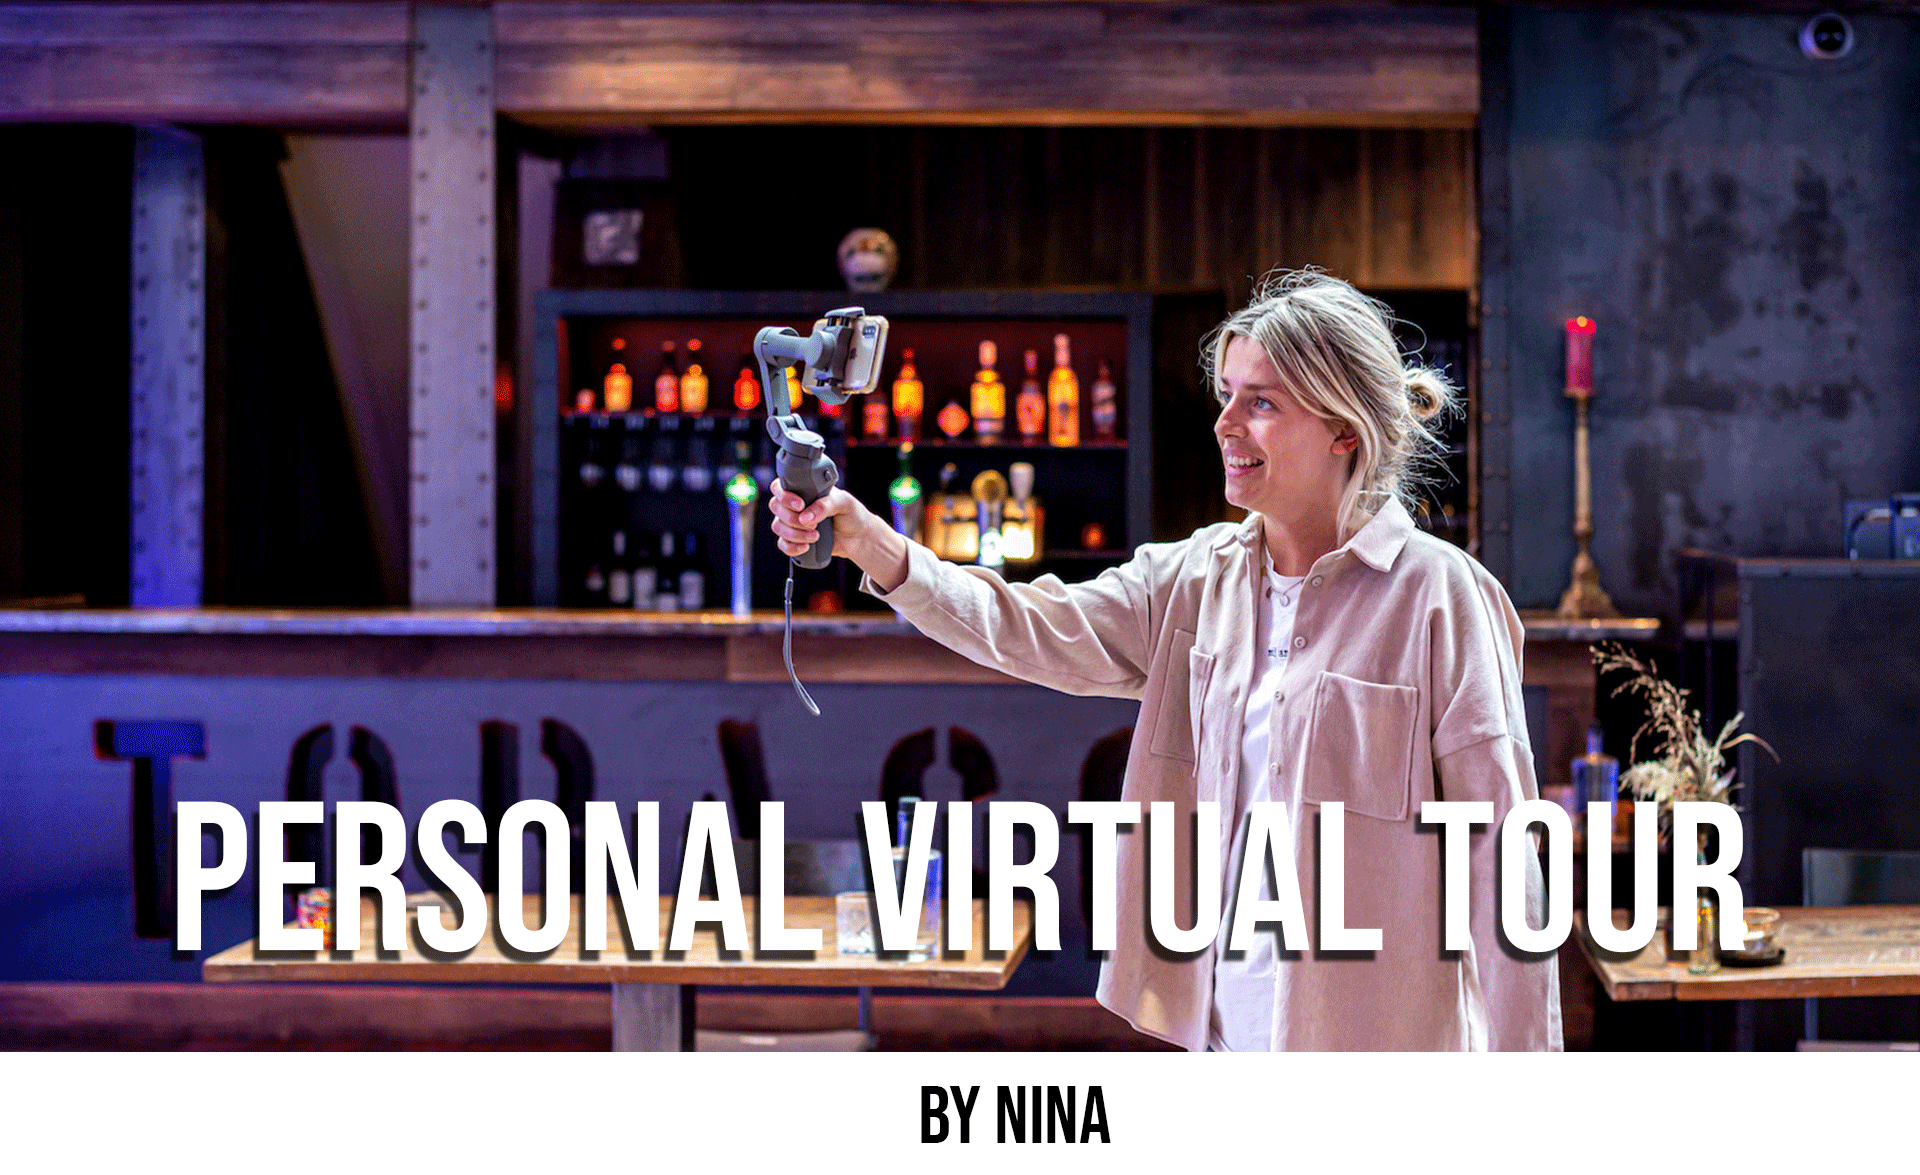 Personal Virtual Tour by Nina